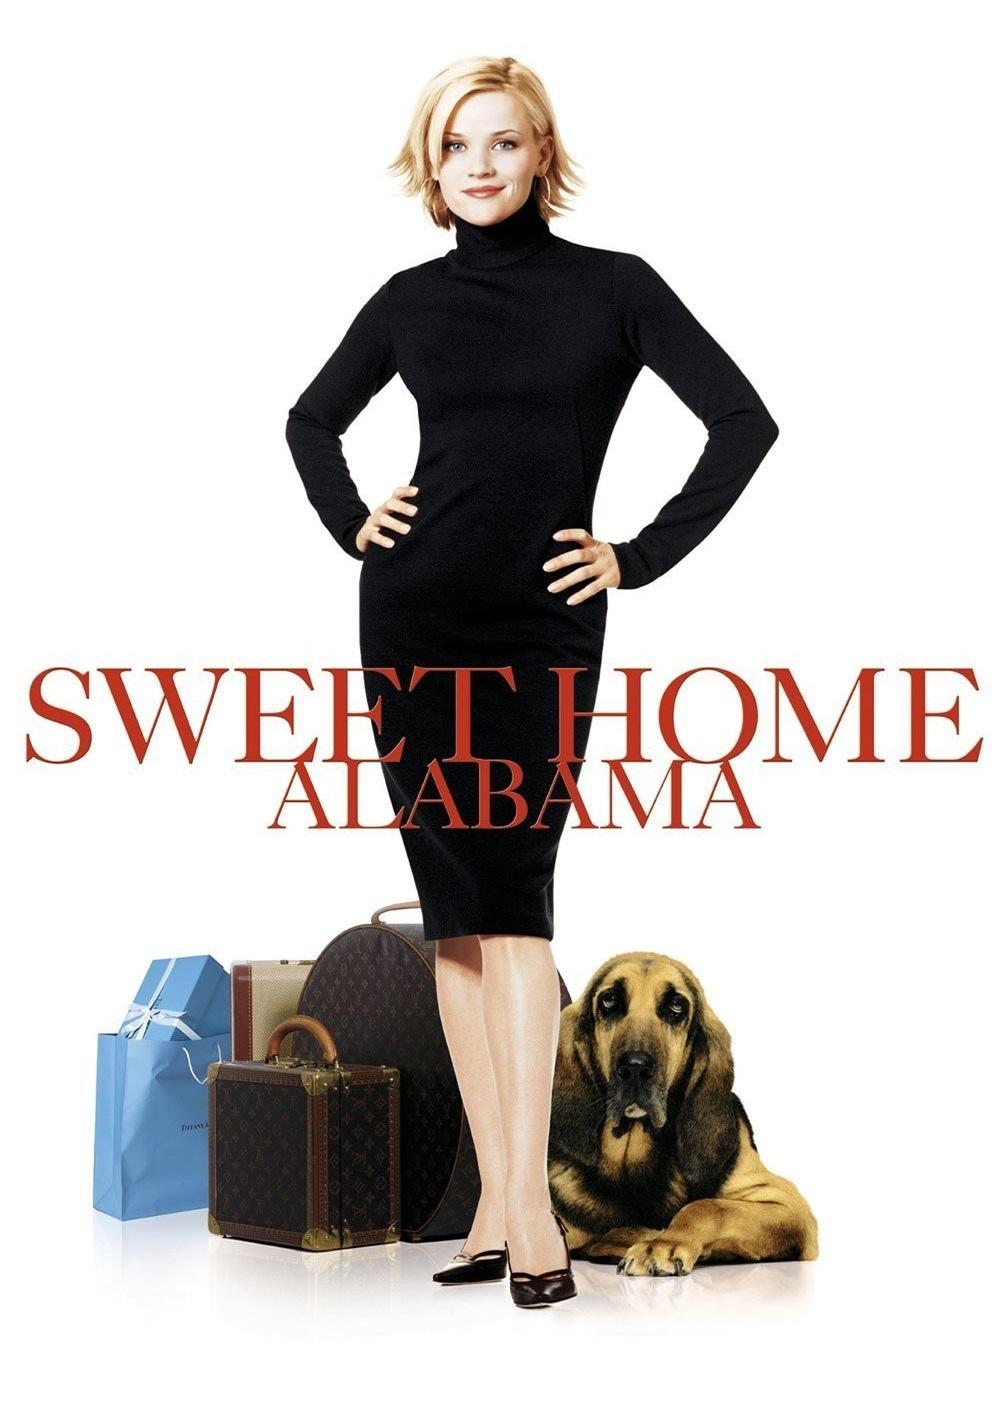 sweet-home-alabama-549e85f682febjpg